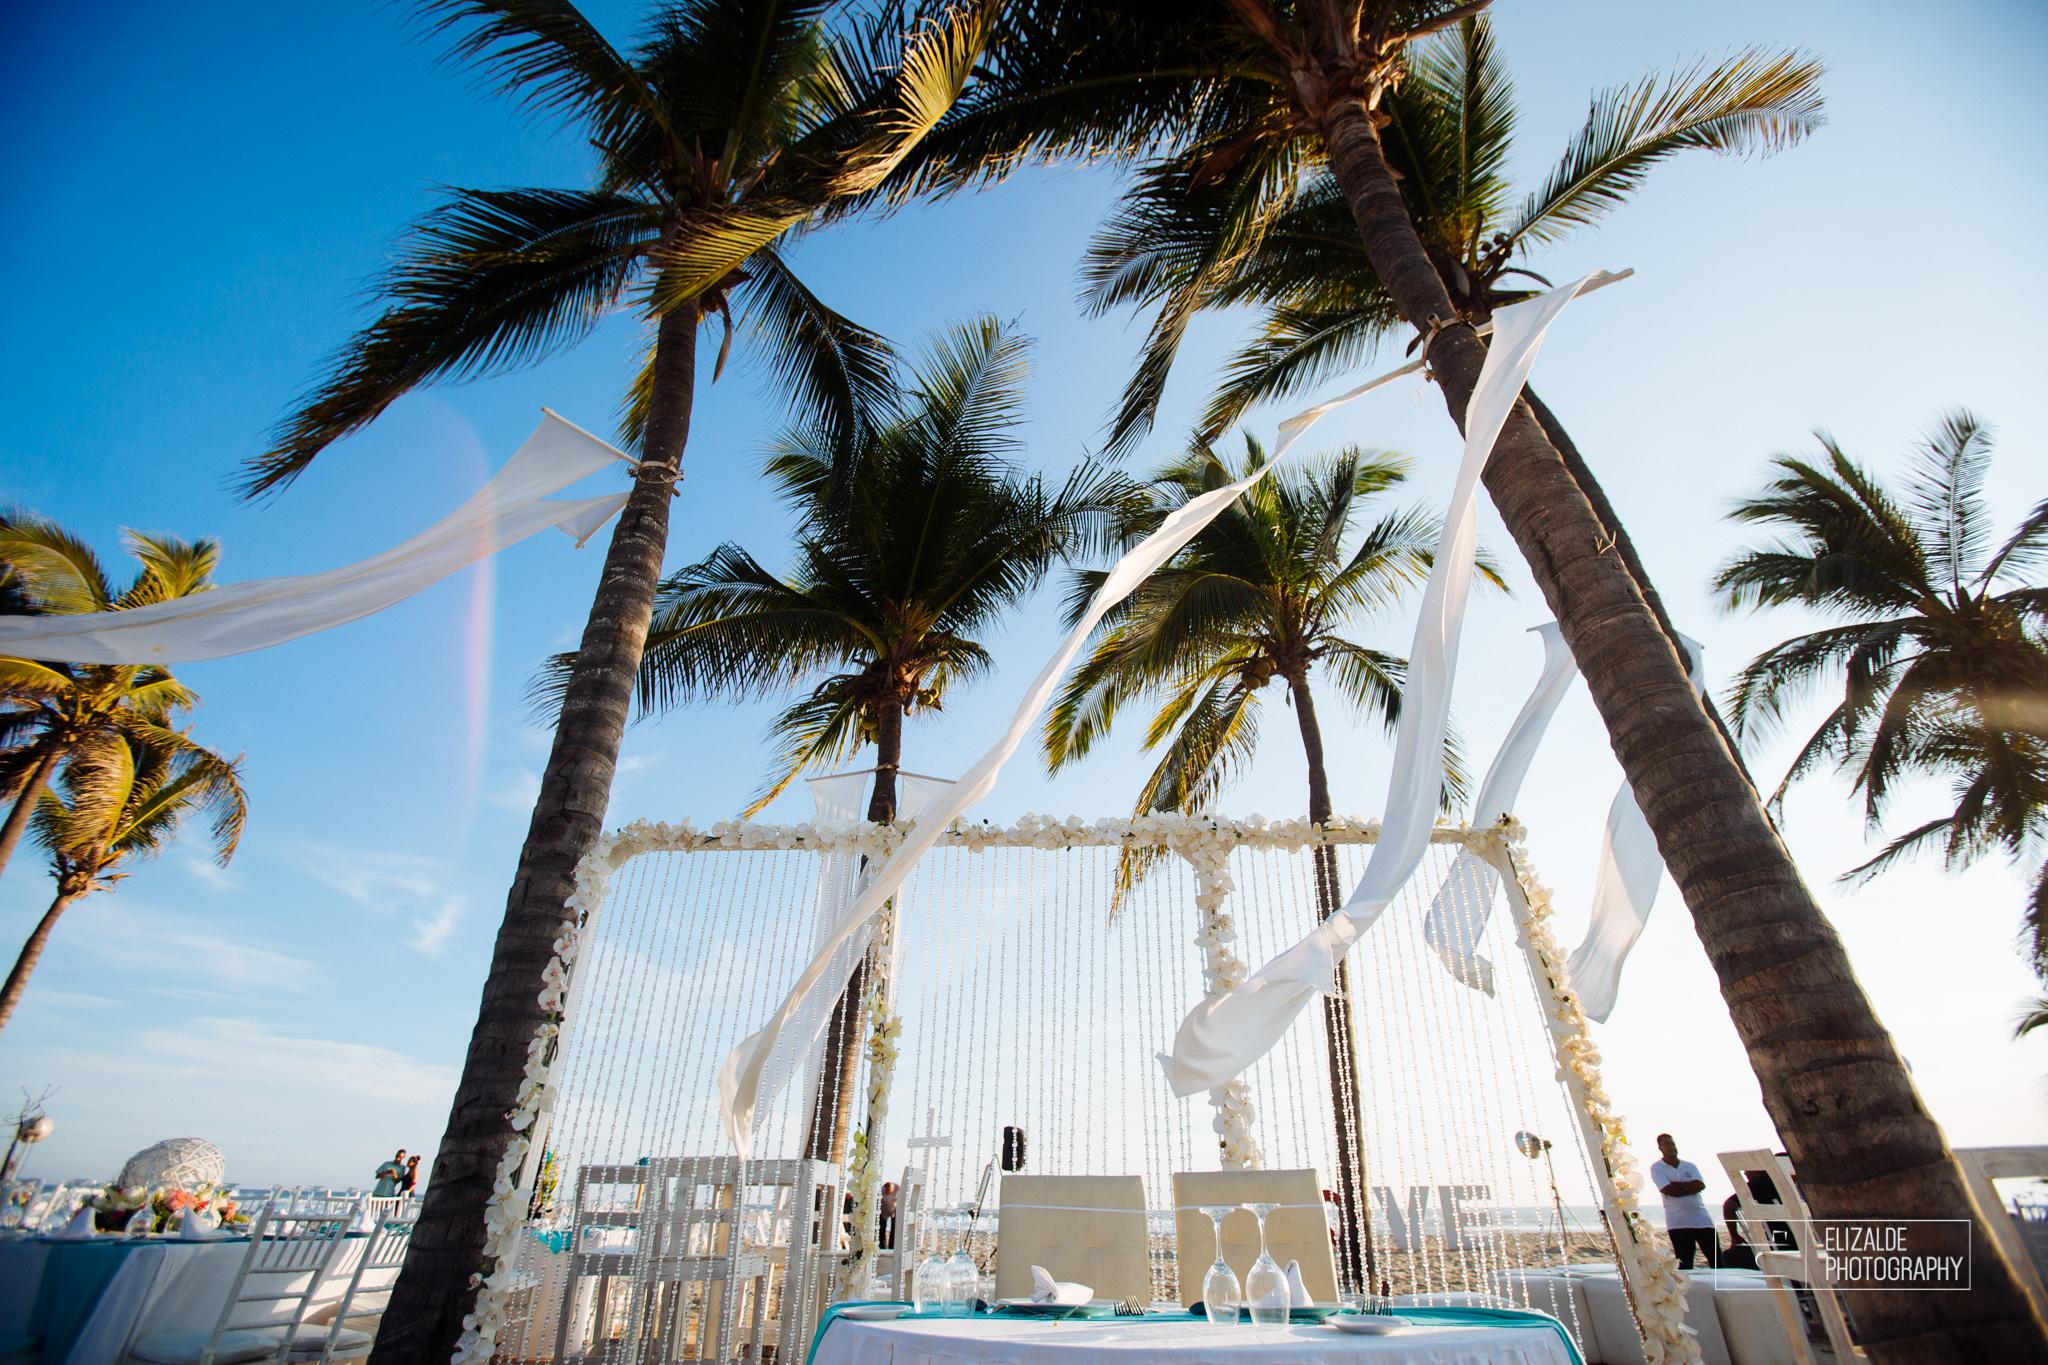 Pay and Ferran_Acapulco_Destination Wedding_Elizalde Photography-70.jpg